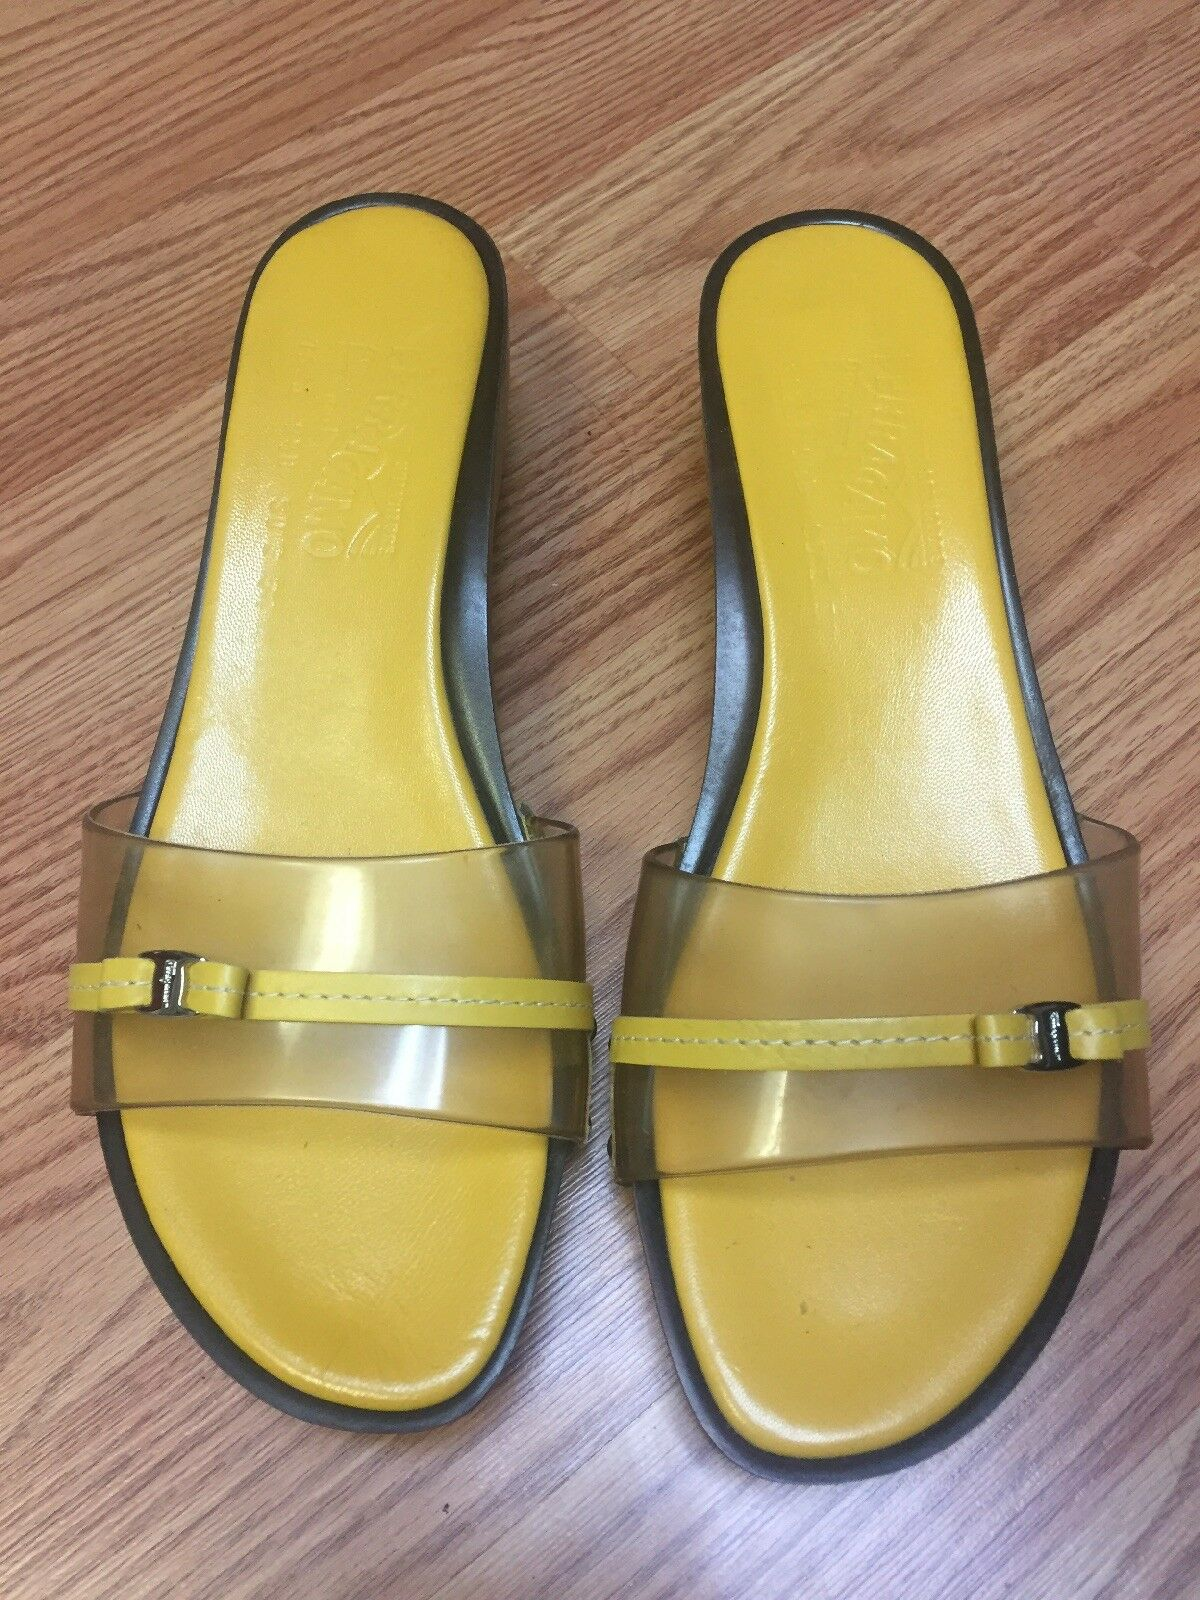 Salvatore Salvatore Salvatore Ferragamo Slip ON Sandals shoes Women Size 9.5B Yellow df2c2c